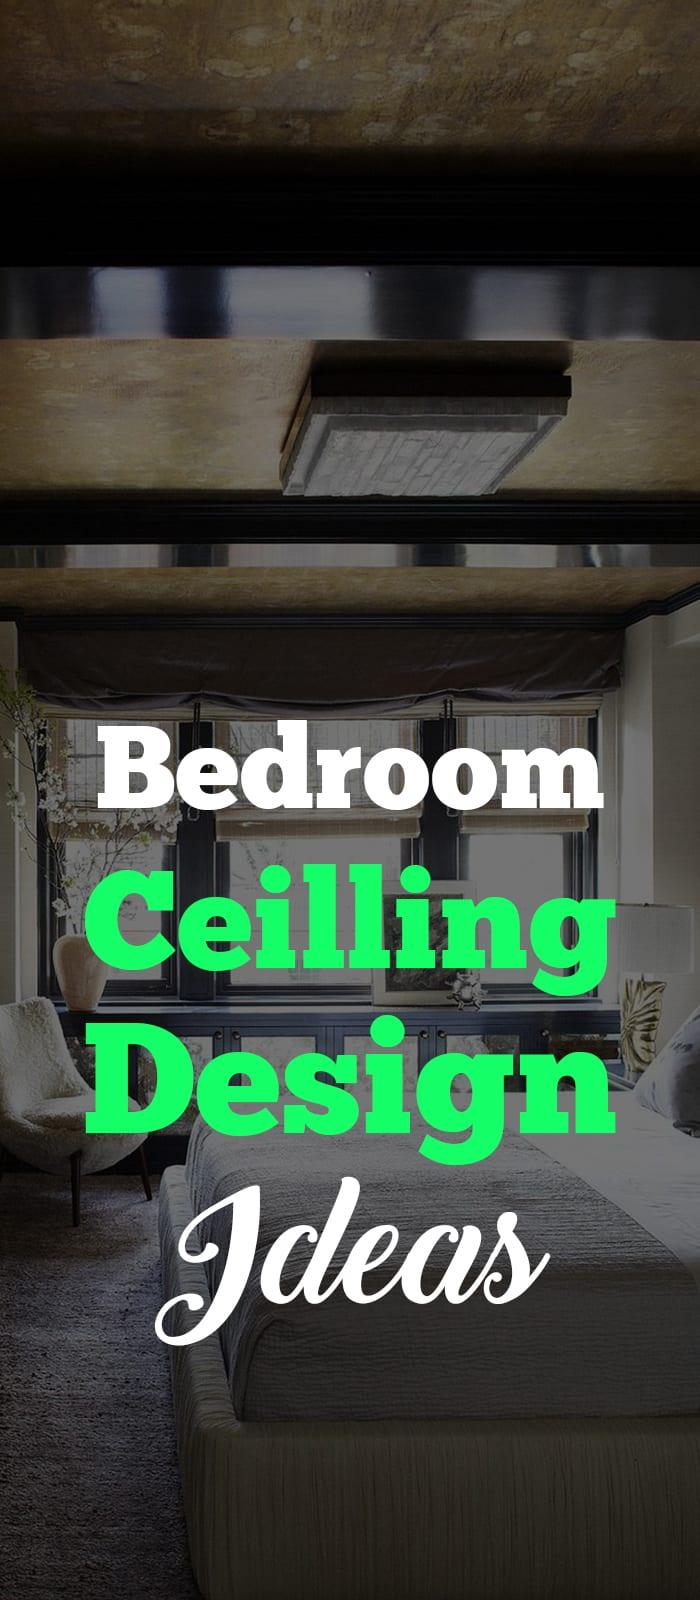 Bedrooms Ceiling Design Ideas.